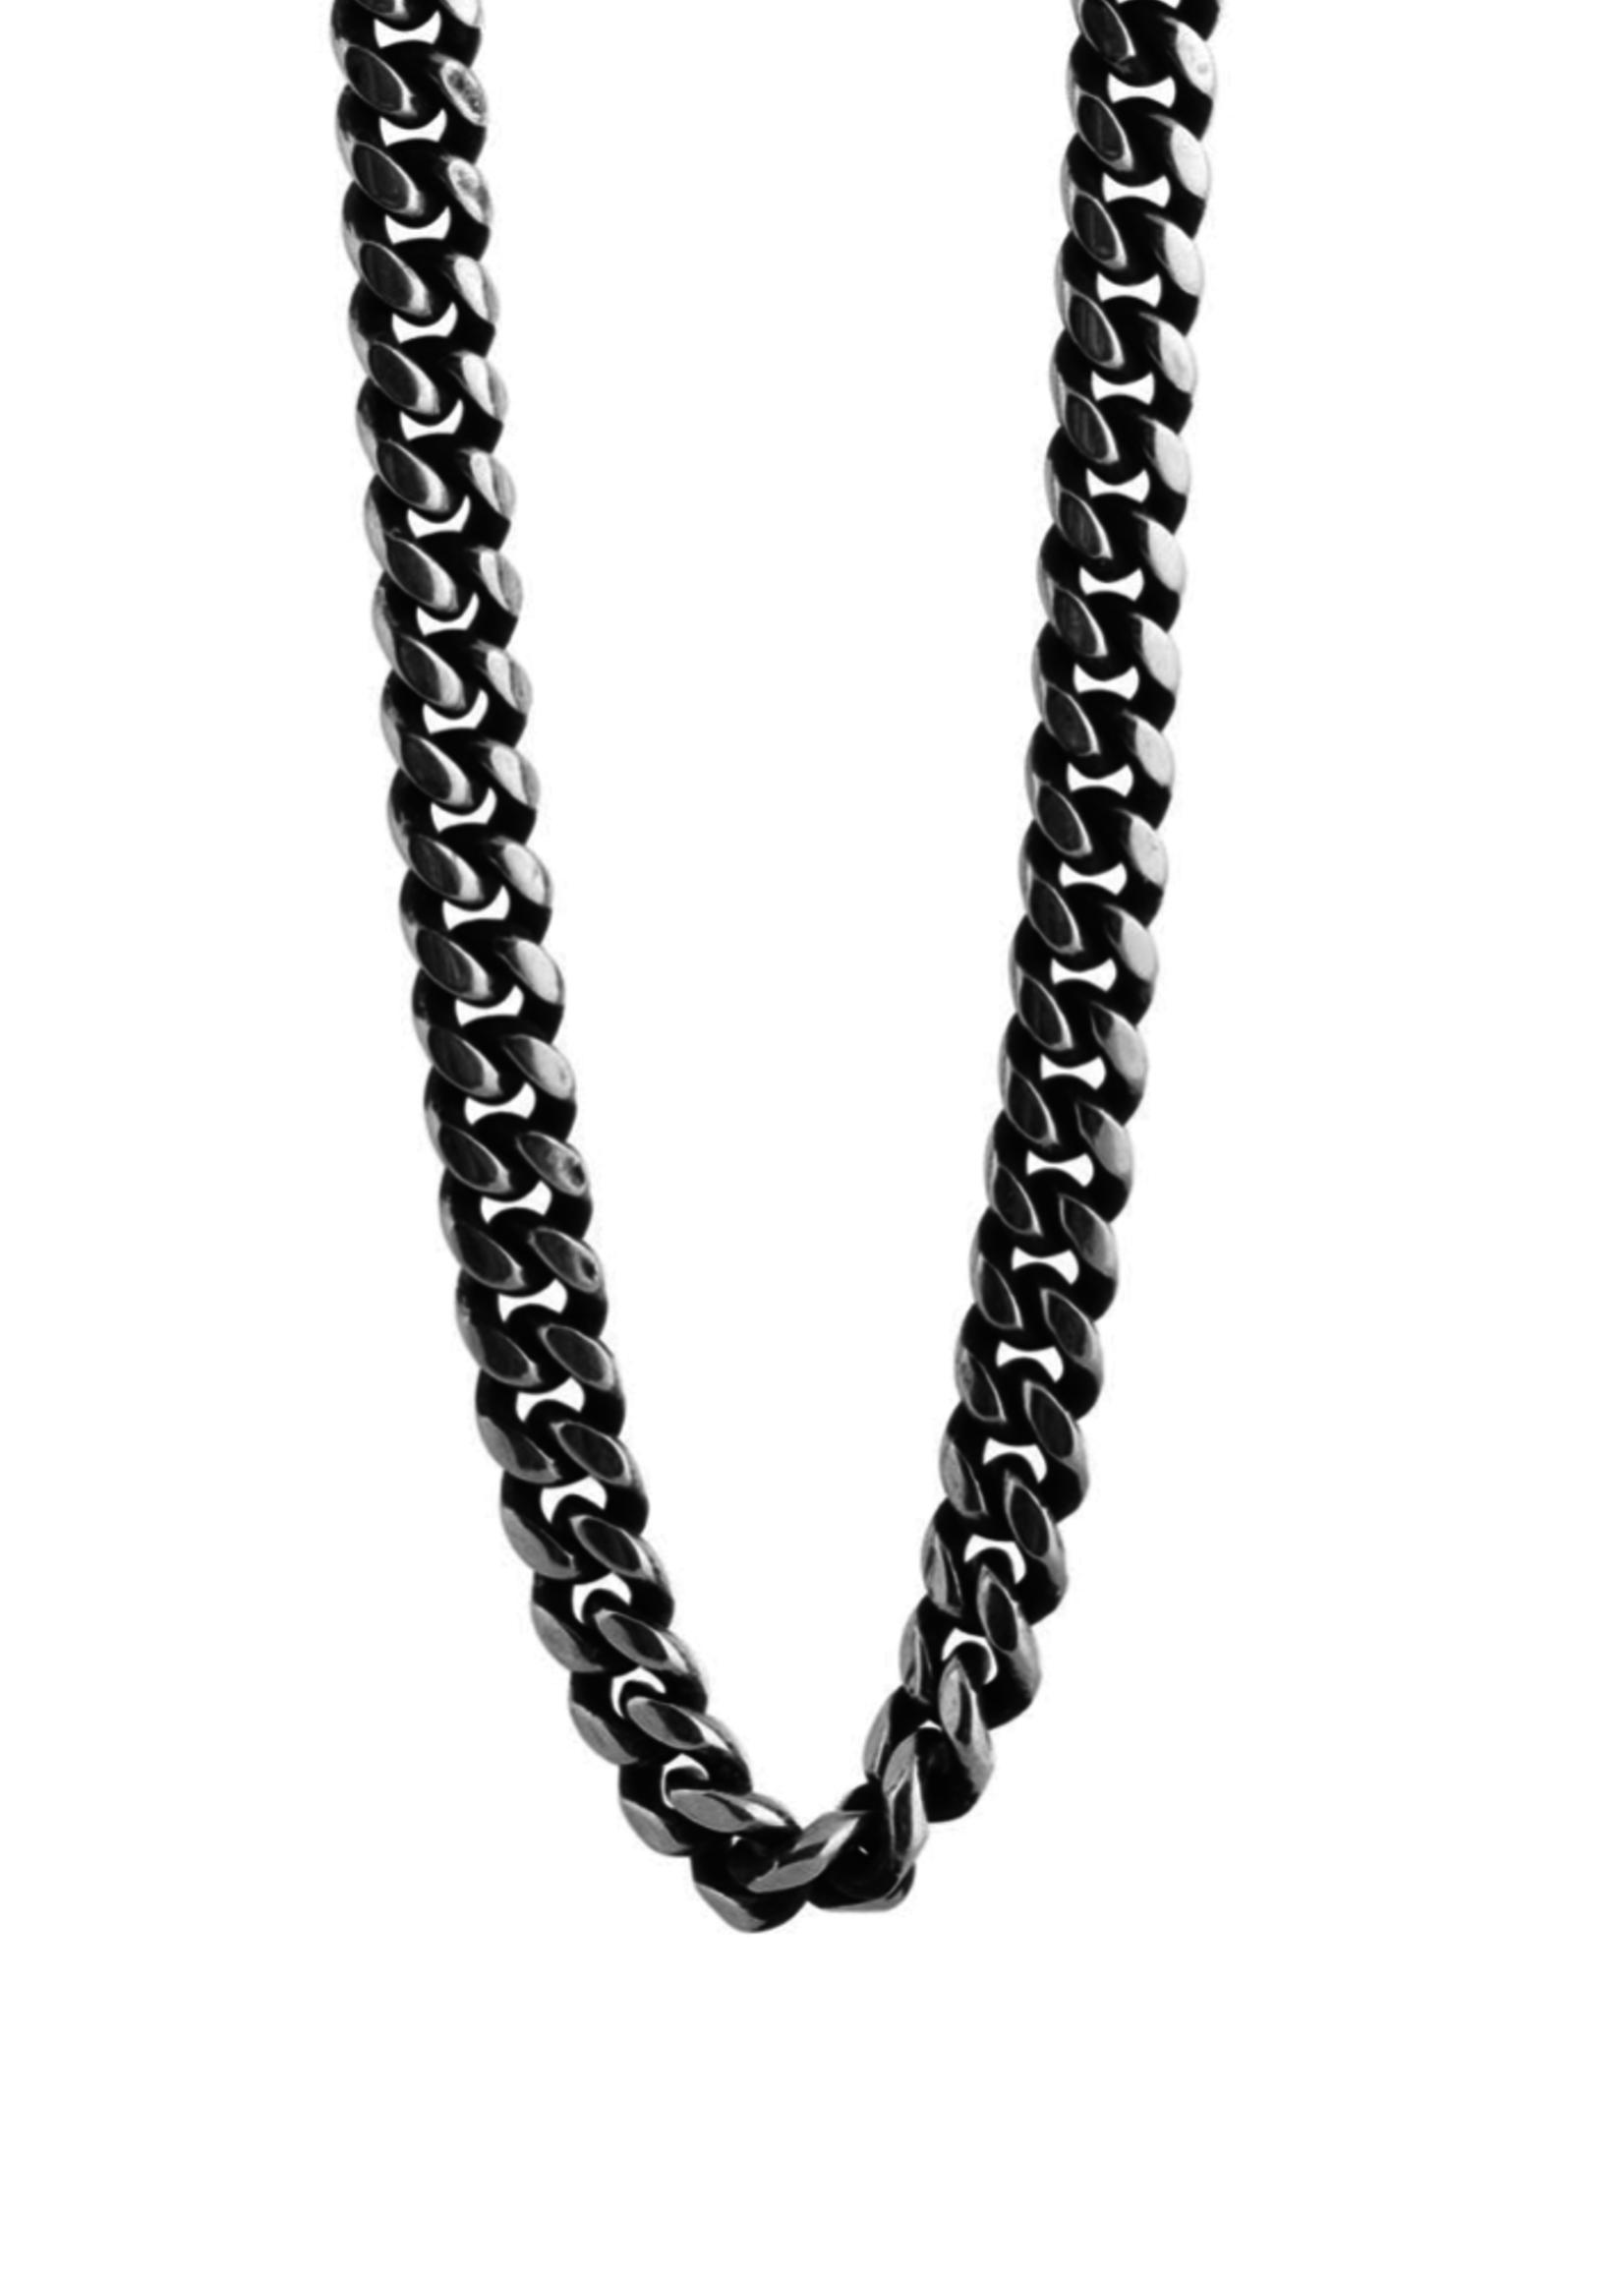 VARON Malo T Chain in Sterling Silver